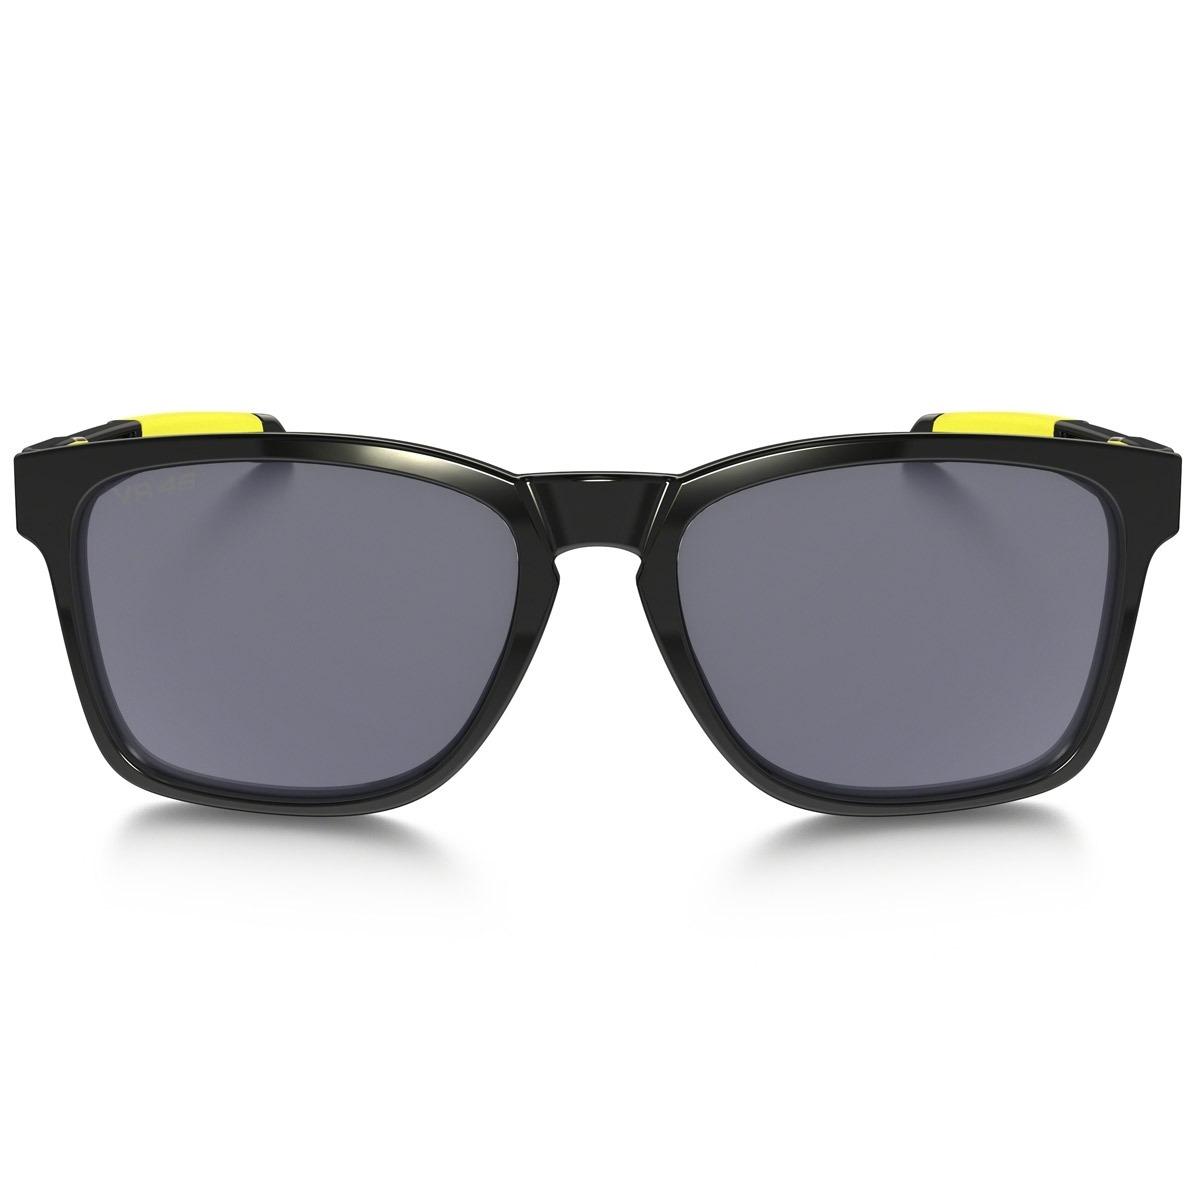 6492378b04590 Óculos Oakley Catalyst Vr46 Motogp - Cut Wave - R  580,00 em Mercado ...